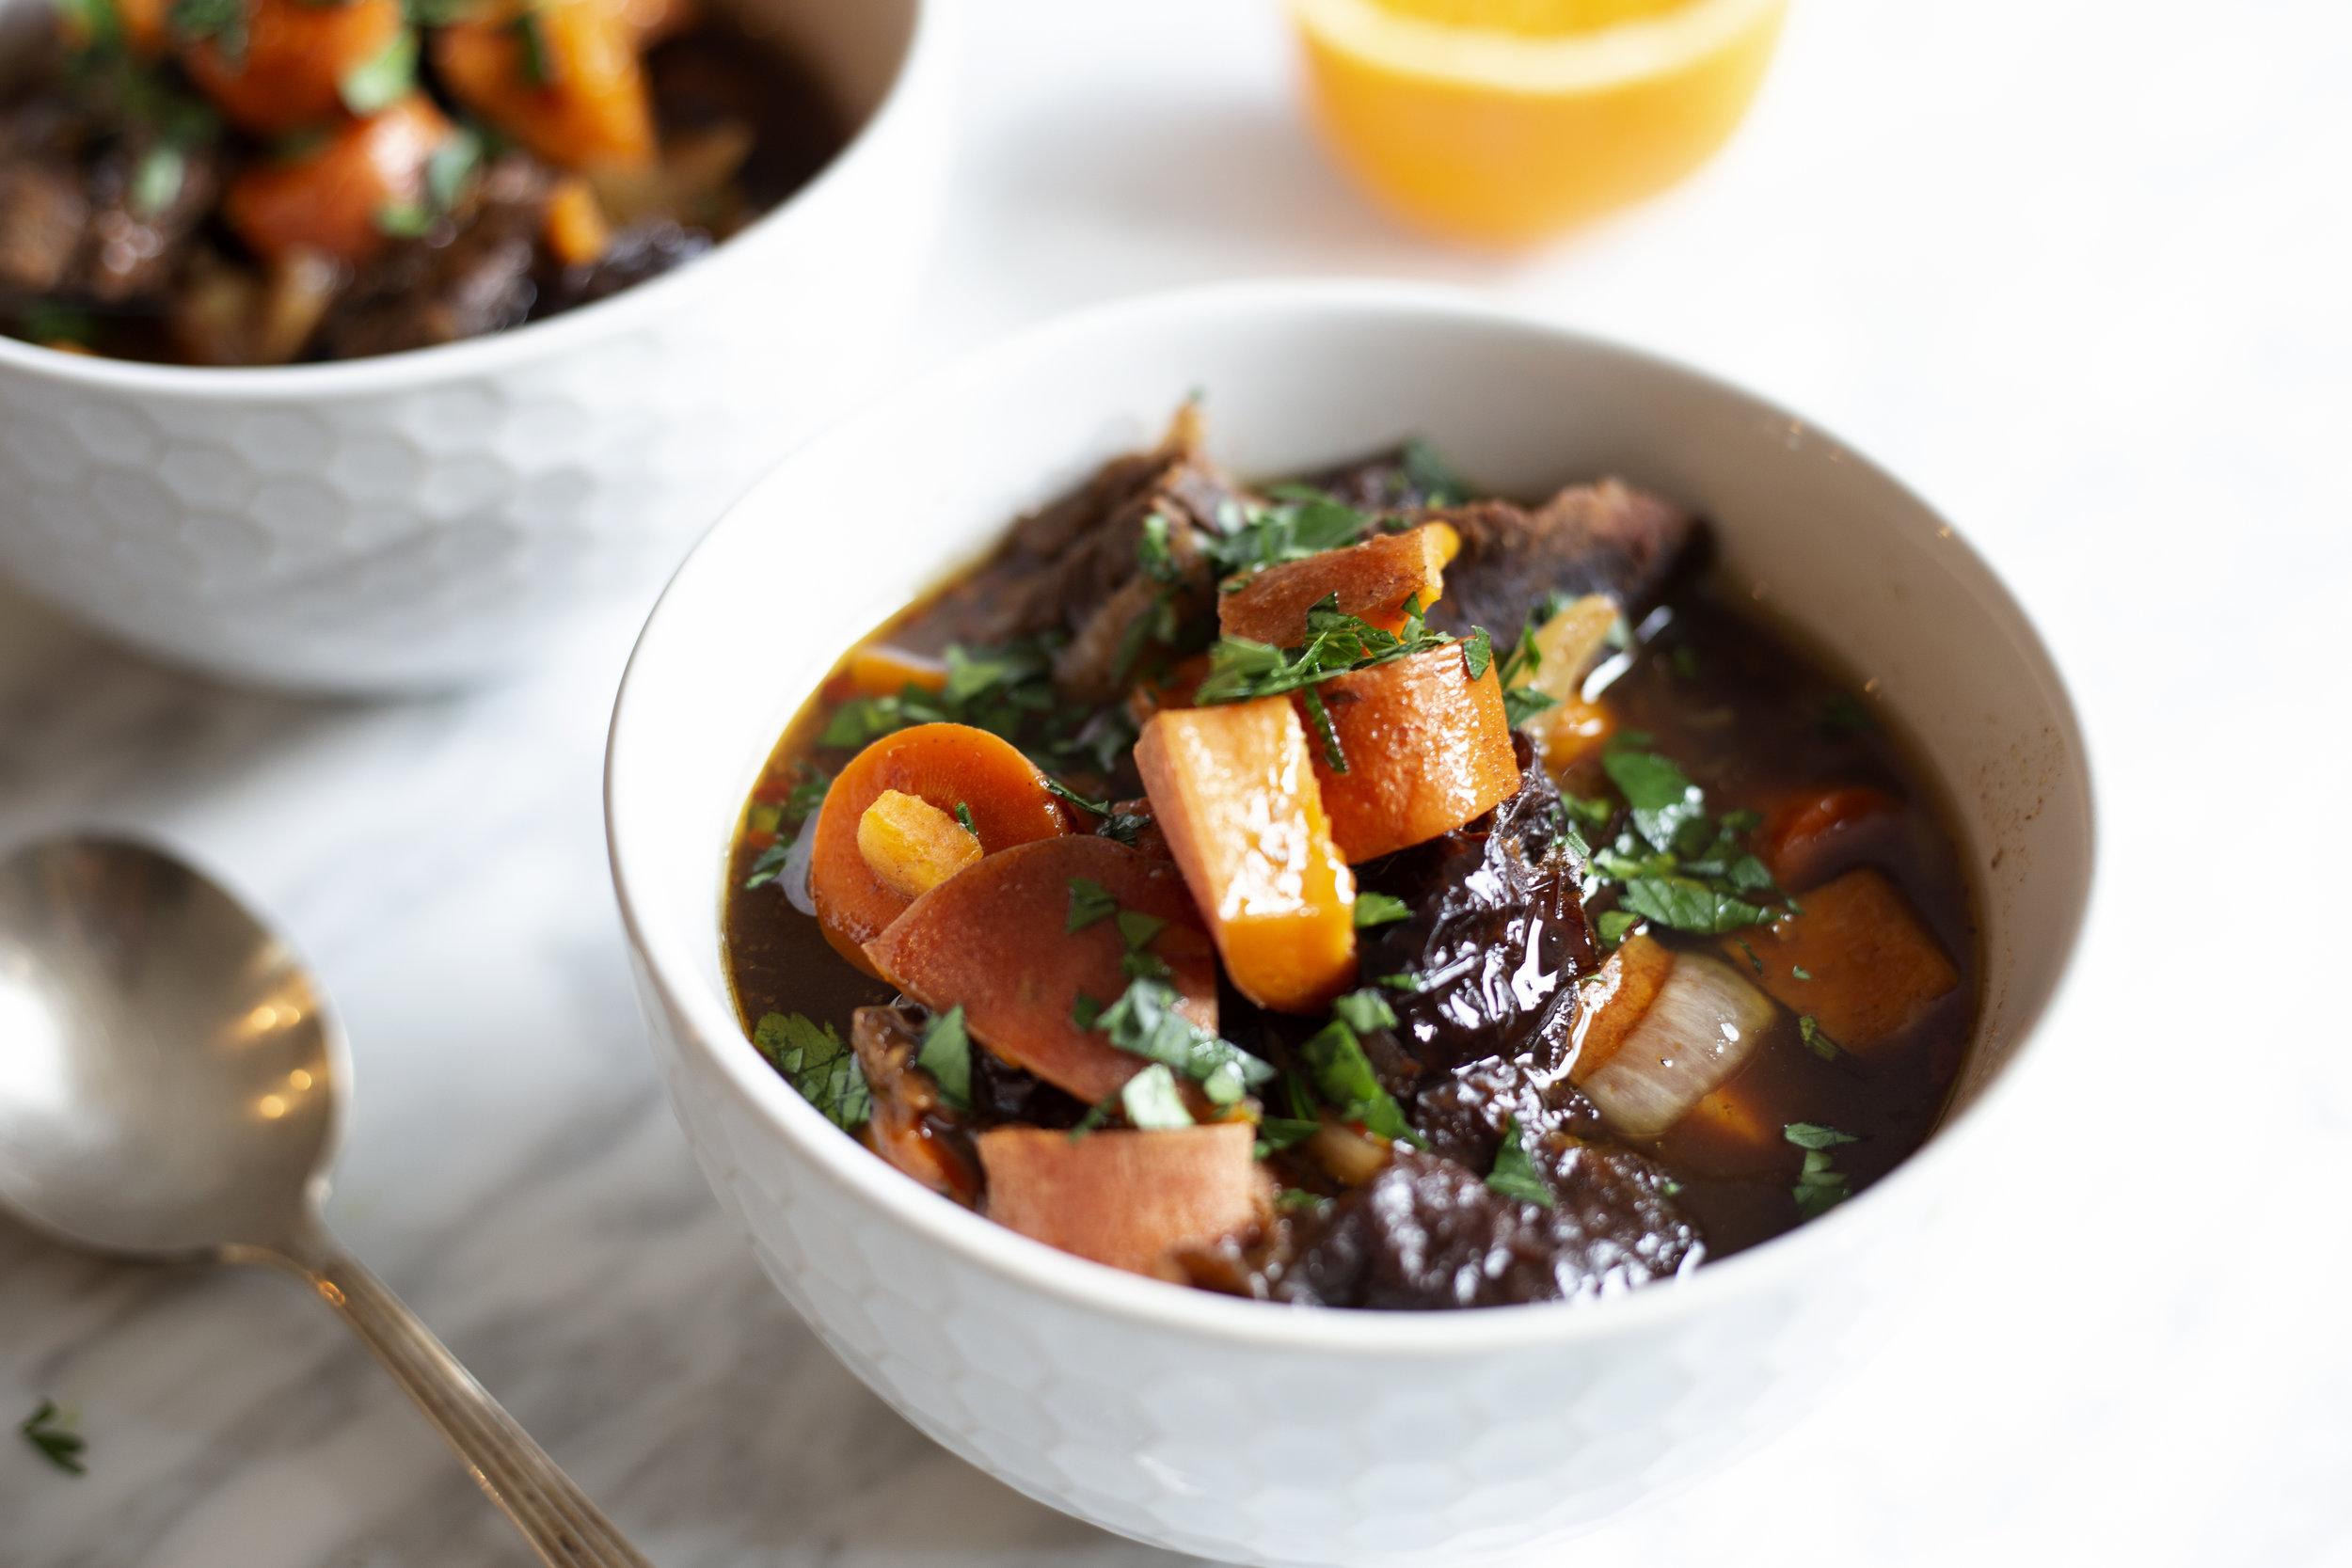 Healthy Slow Cooker Grass-Fed Beef Stew by Alavita Prenatal Nutrition